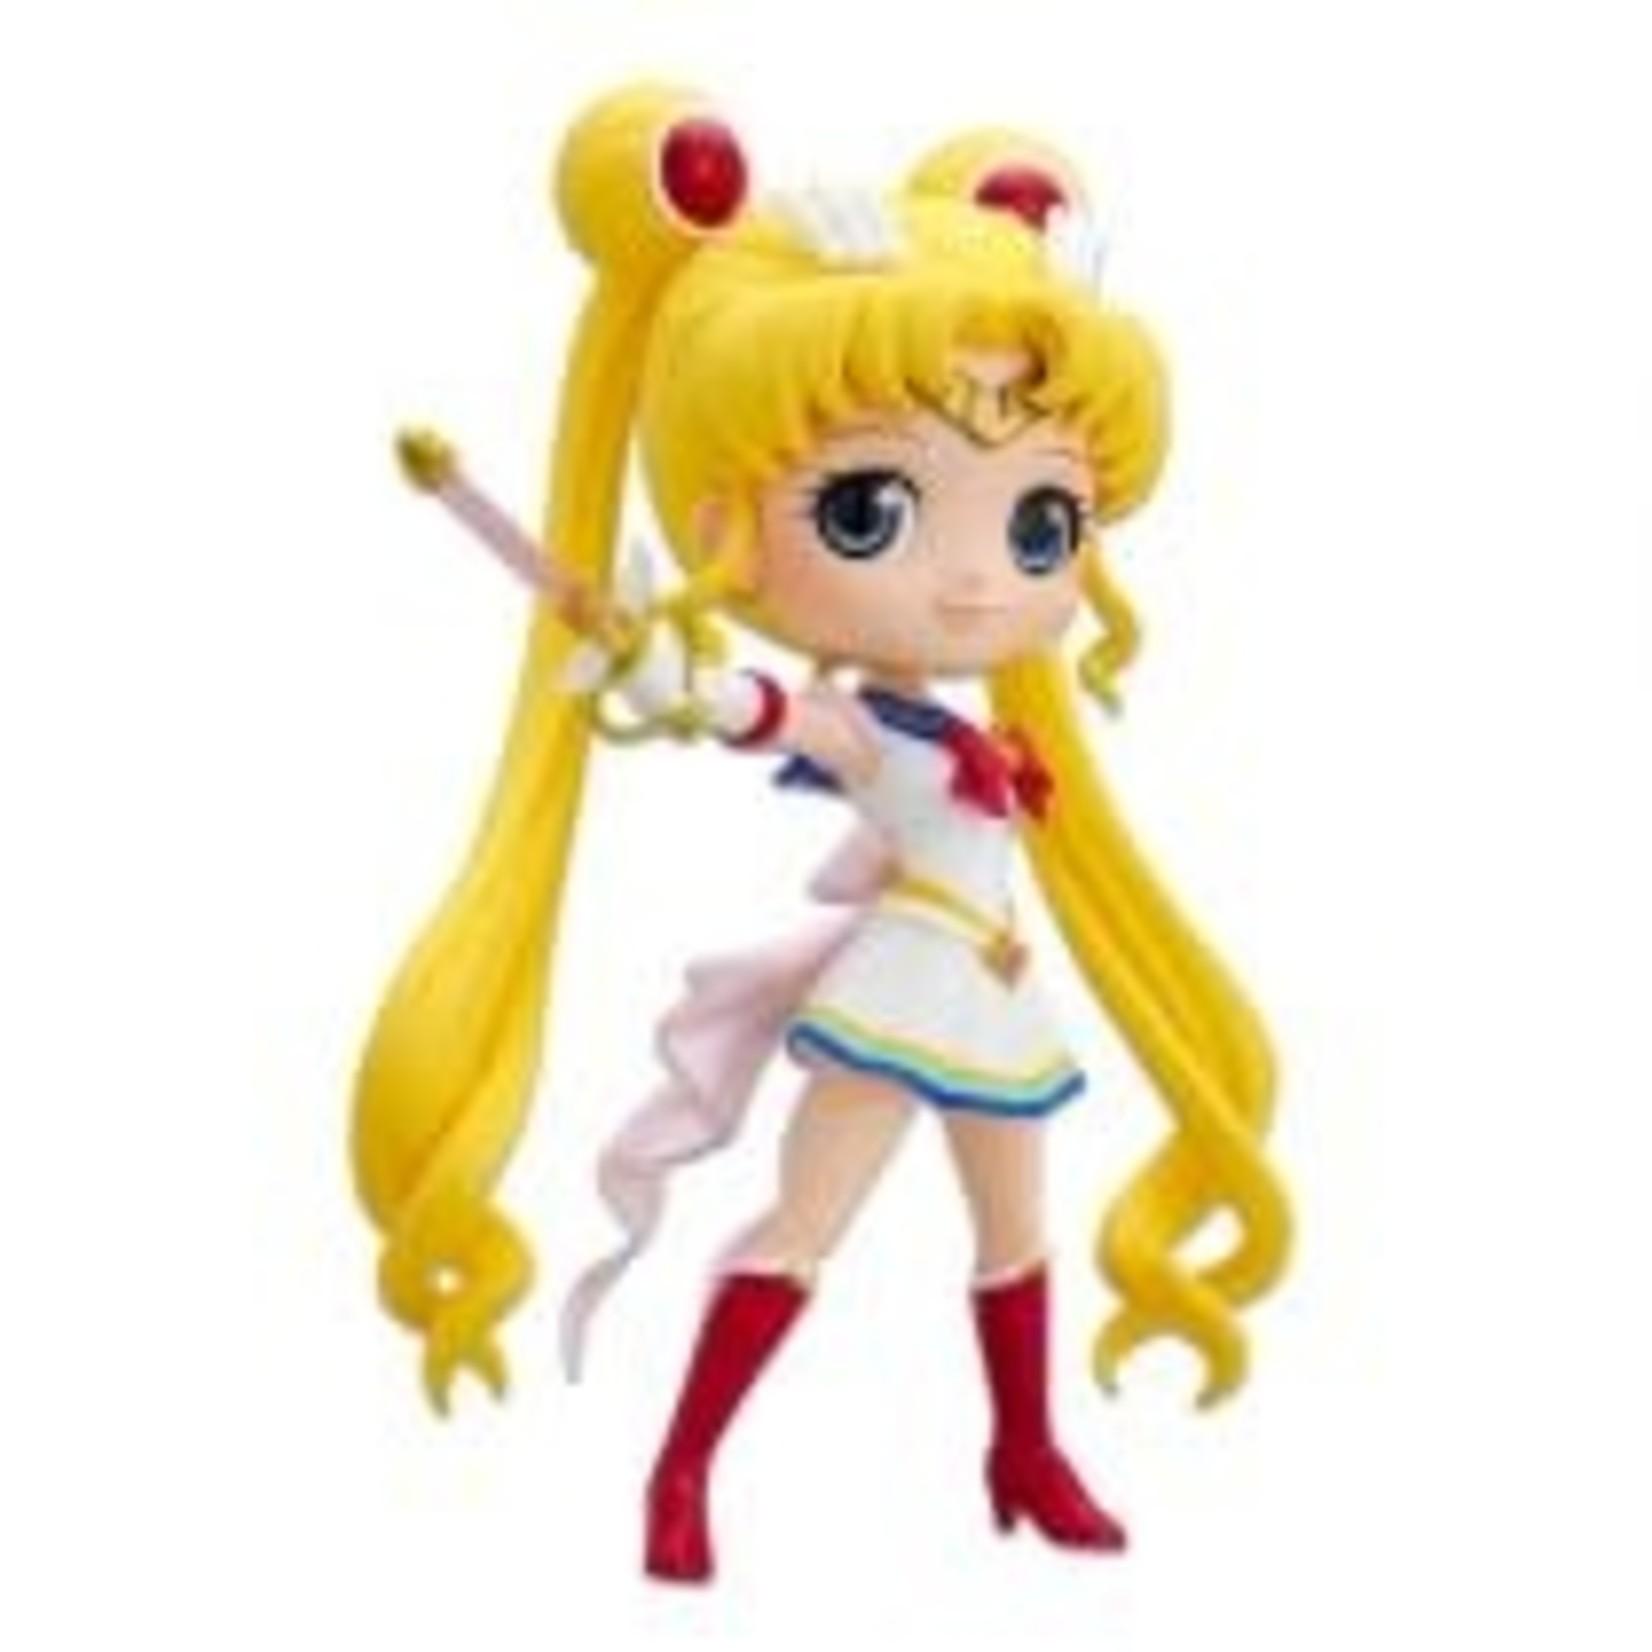 FIGURE-Pretty Guardian Sailor Moon Eternal the Movie Super Sailor Moon